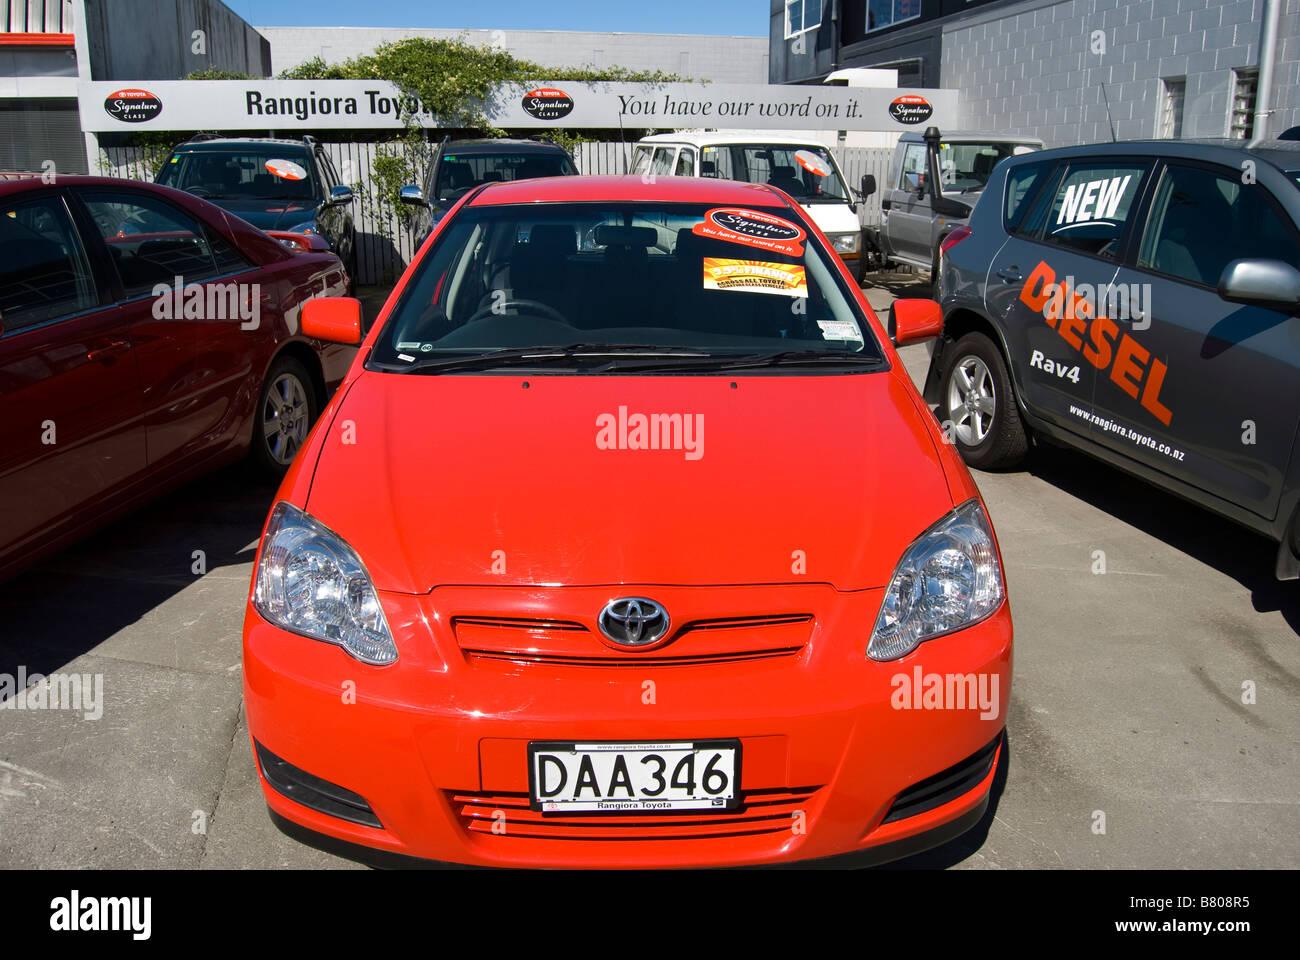 Rangiora Toyota Car Dealers, Rangiora, Waimakariri District, Canterbury, New Zealand - Stock Image